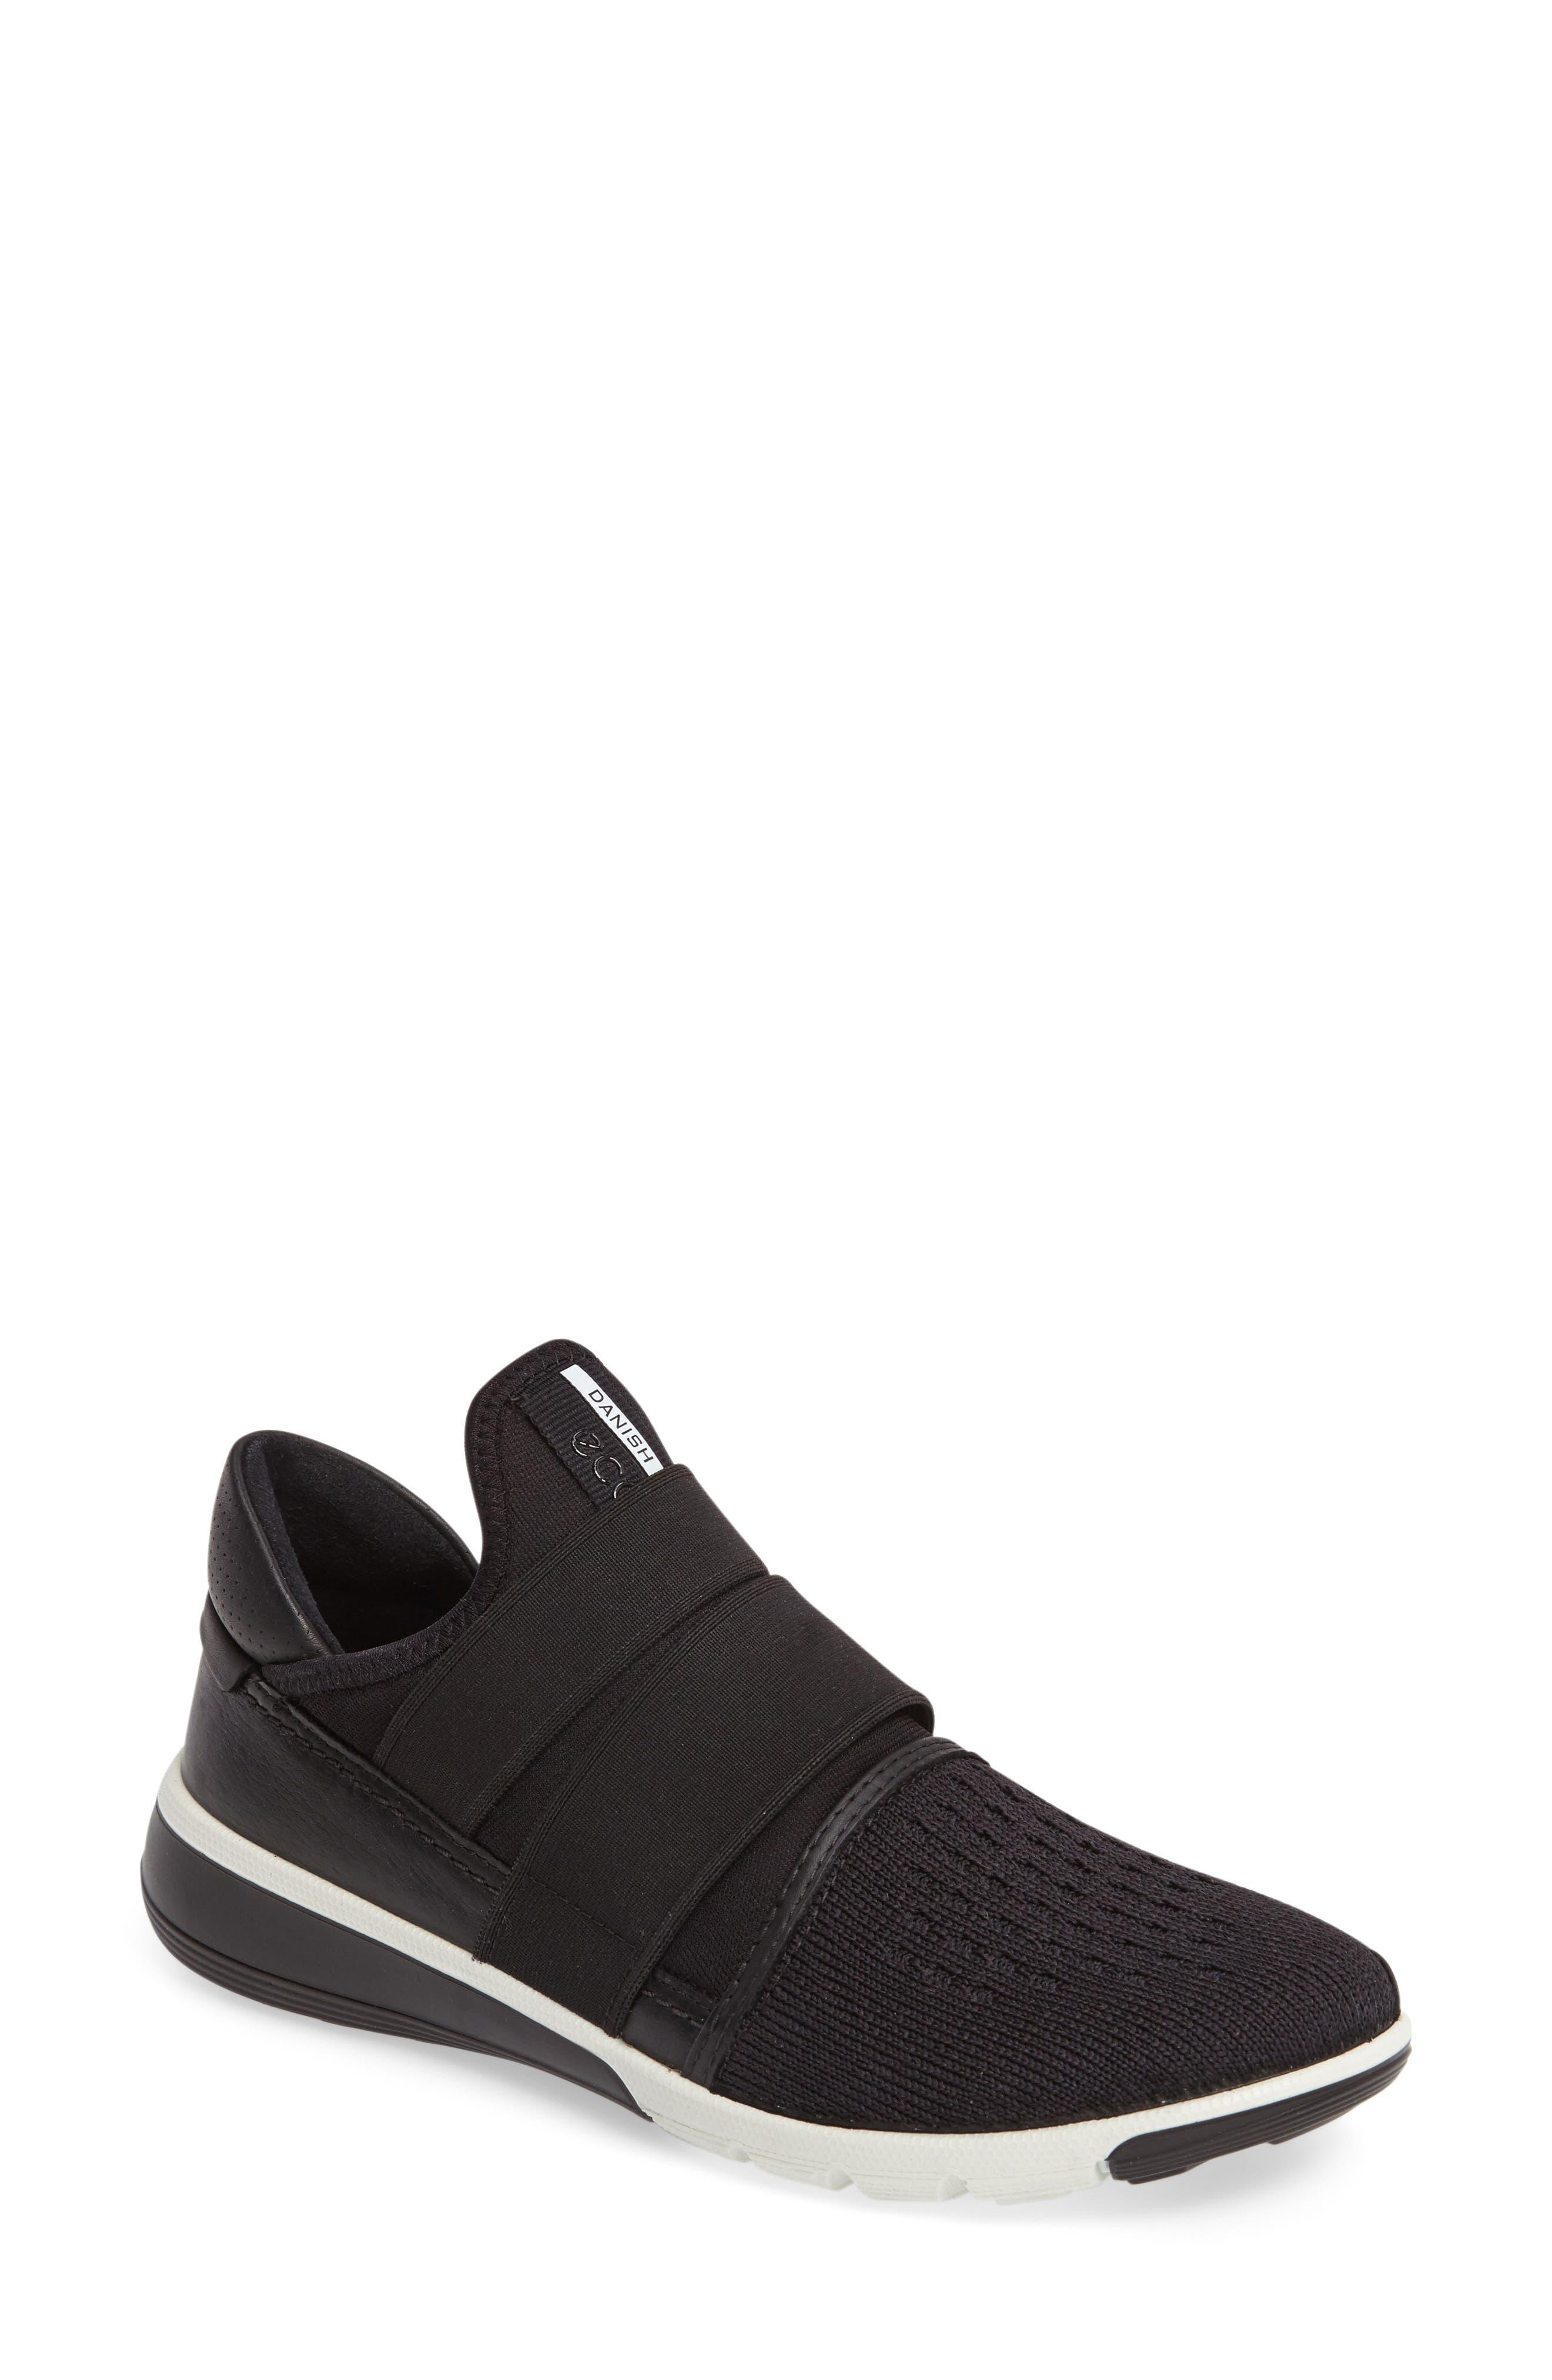 'Intrinsic 2' Sneaker,                             Main thumbnail 1, color,                             001